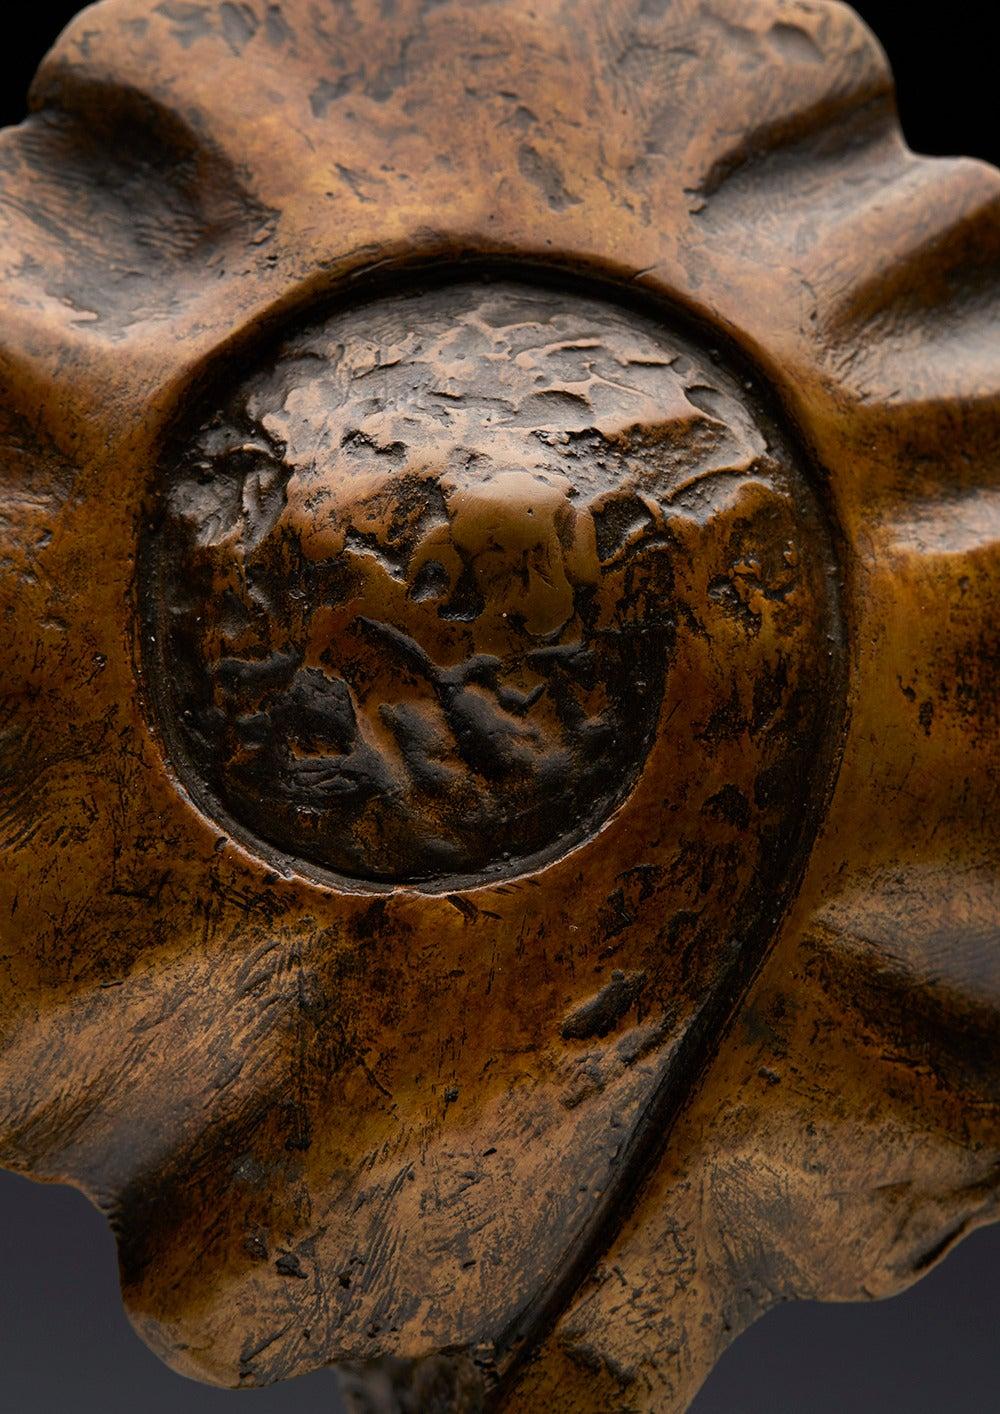 Profile Heads, Limited Edition Bronze Sculpture by John Farnham For Sale 2